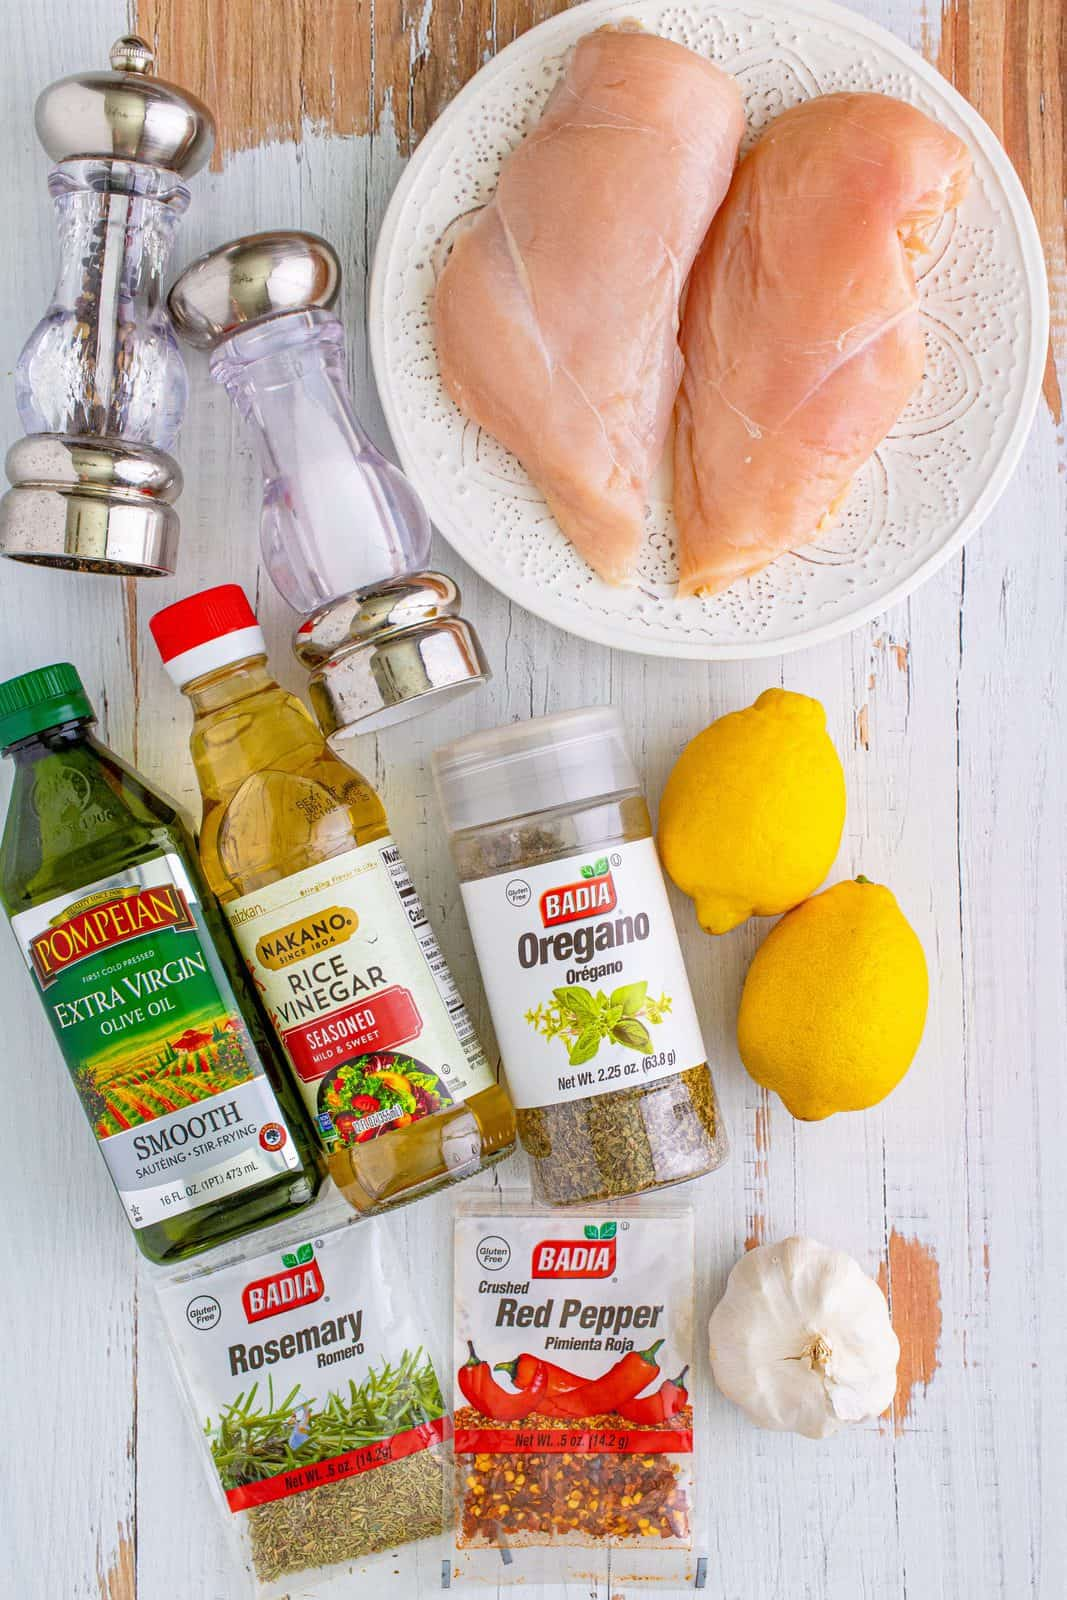 ingredients needed: chicken breast, rice vinegar, lemon, garlic, olive oil, oregano and rosemary.